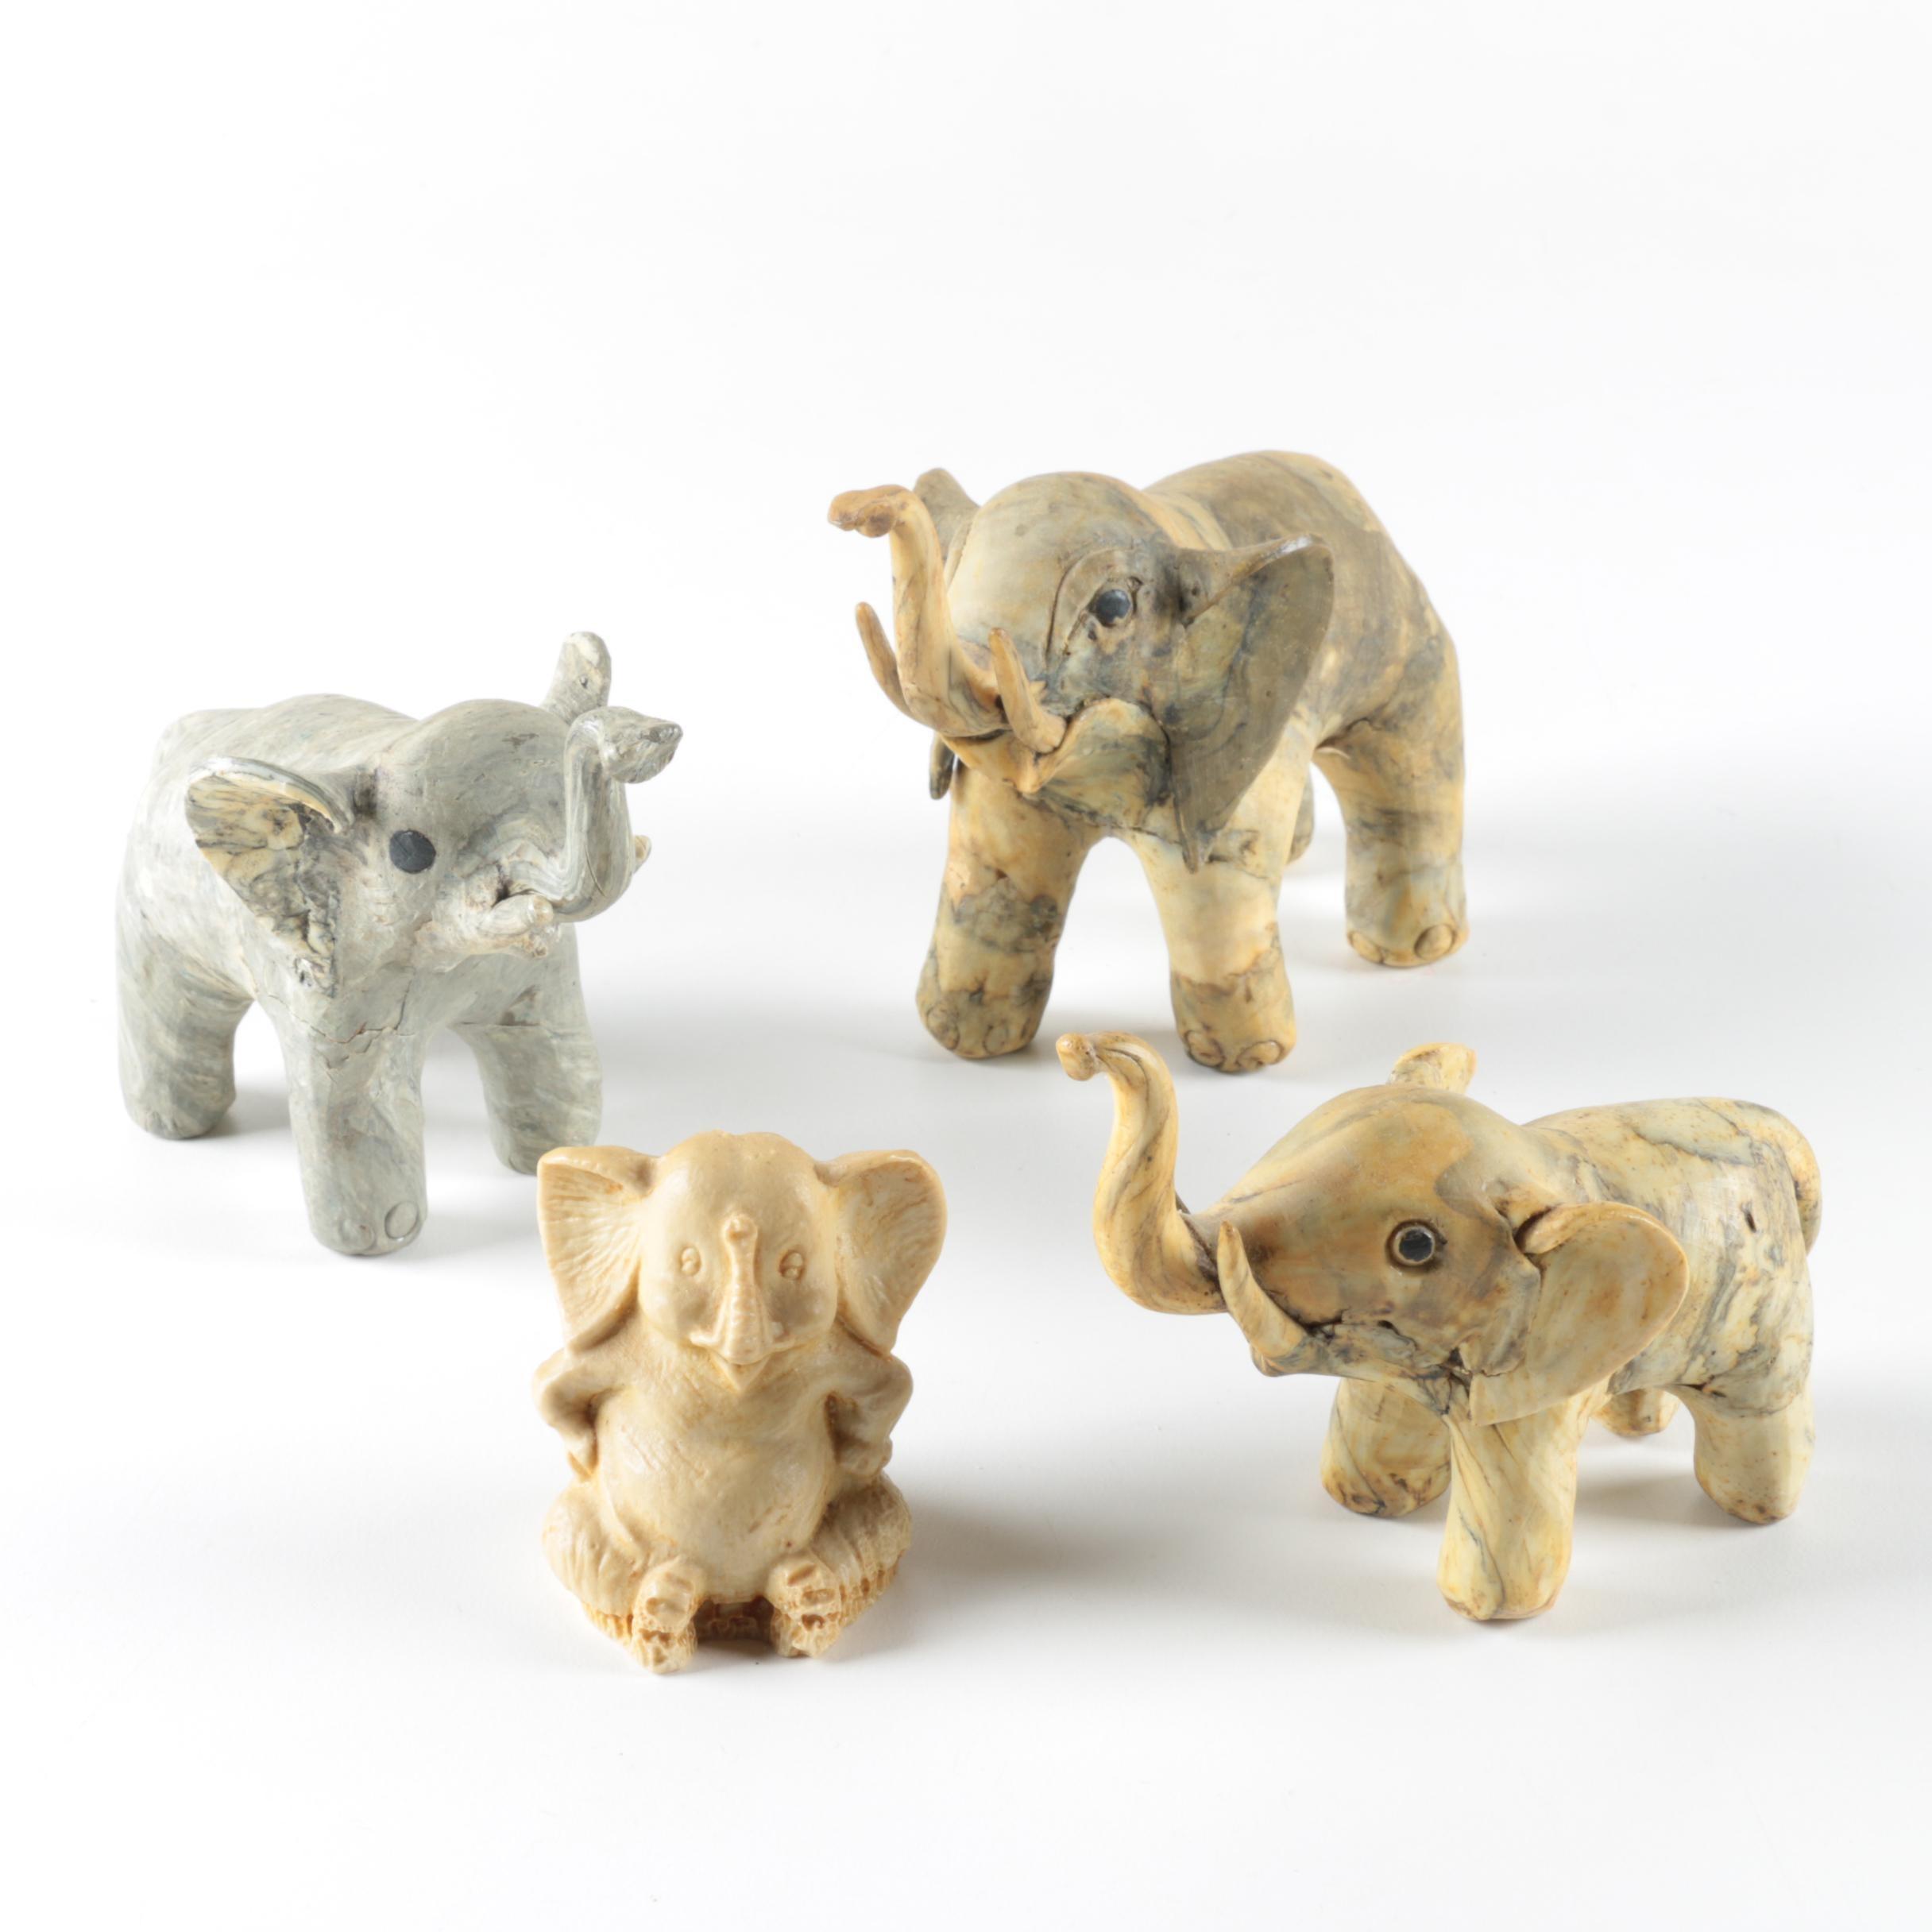 Wooden Elephant Figurines